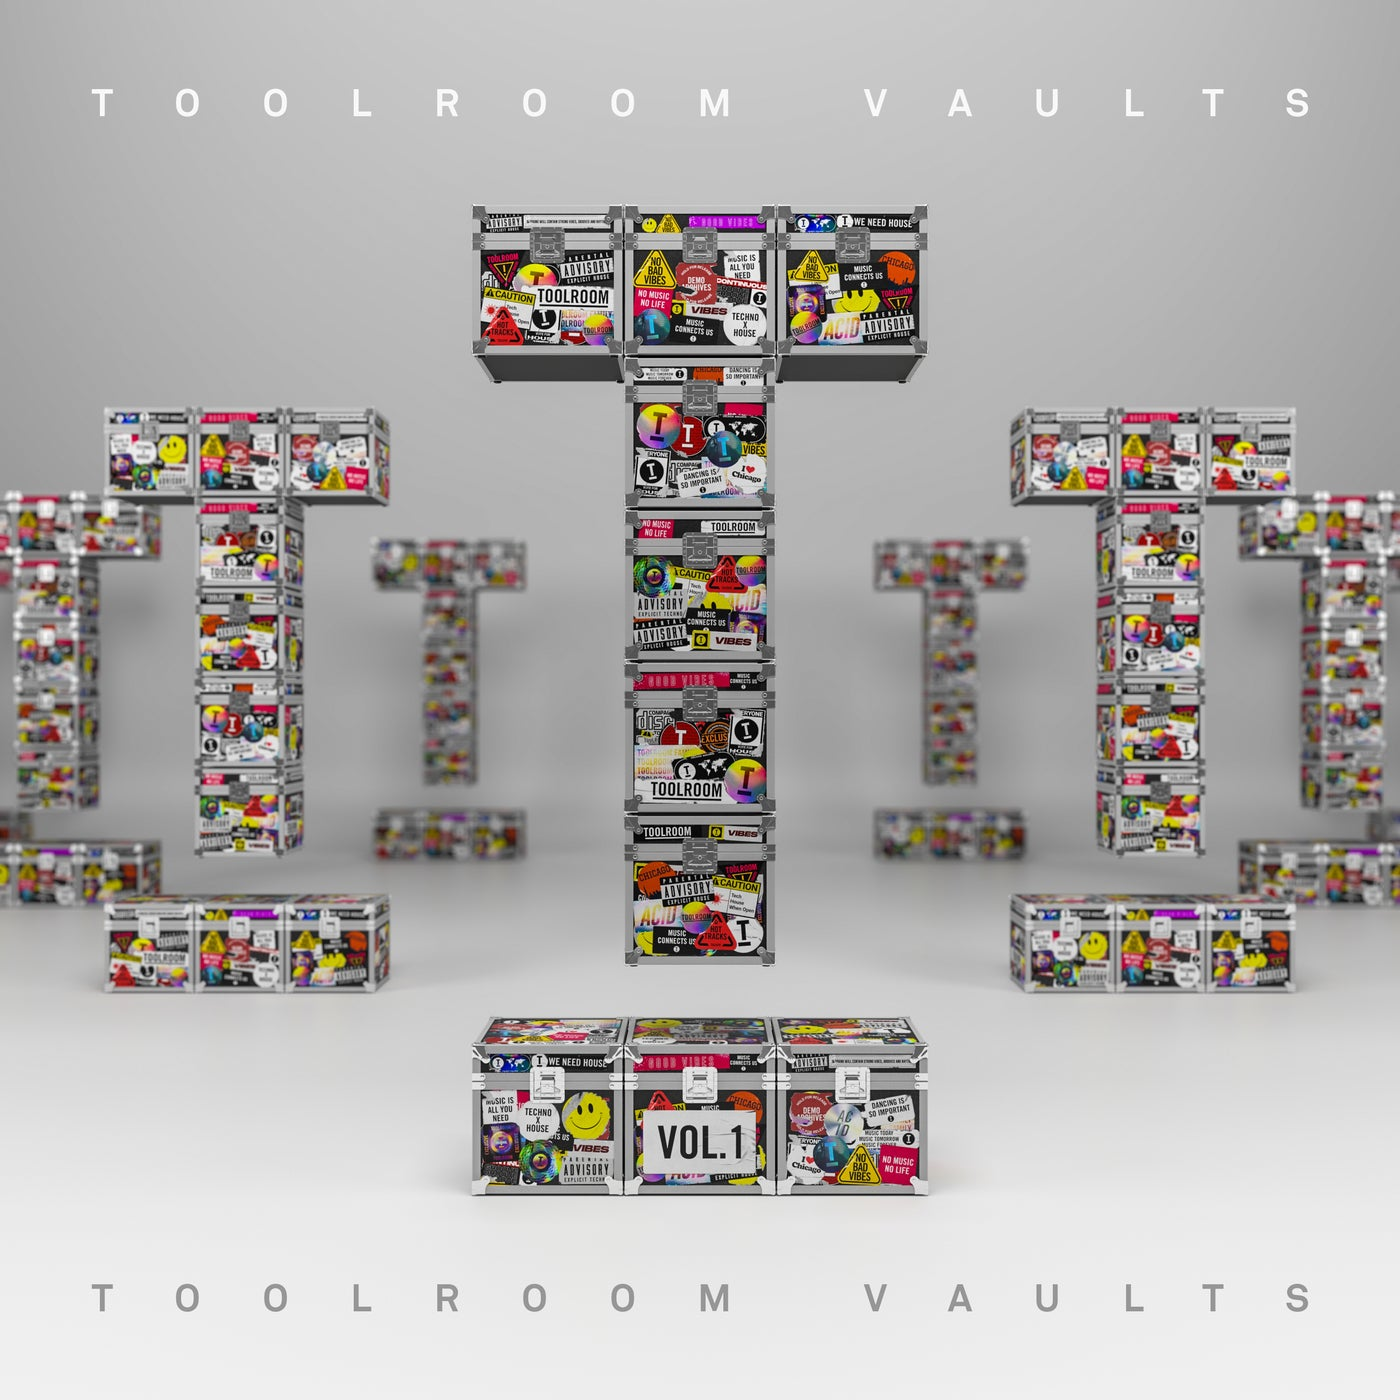 Toolroom Vaults Vol. 1